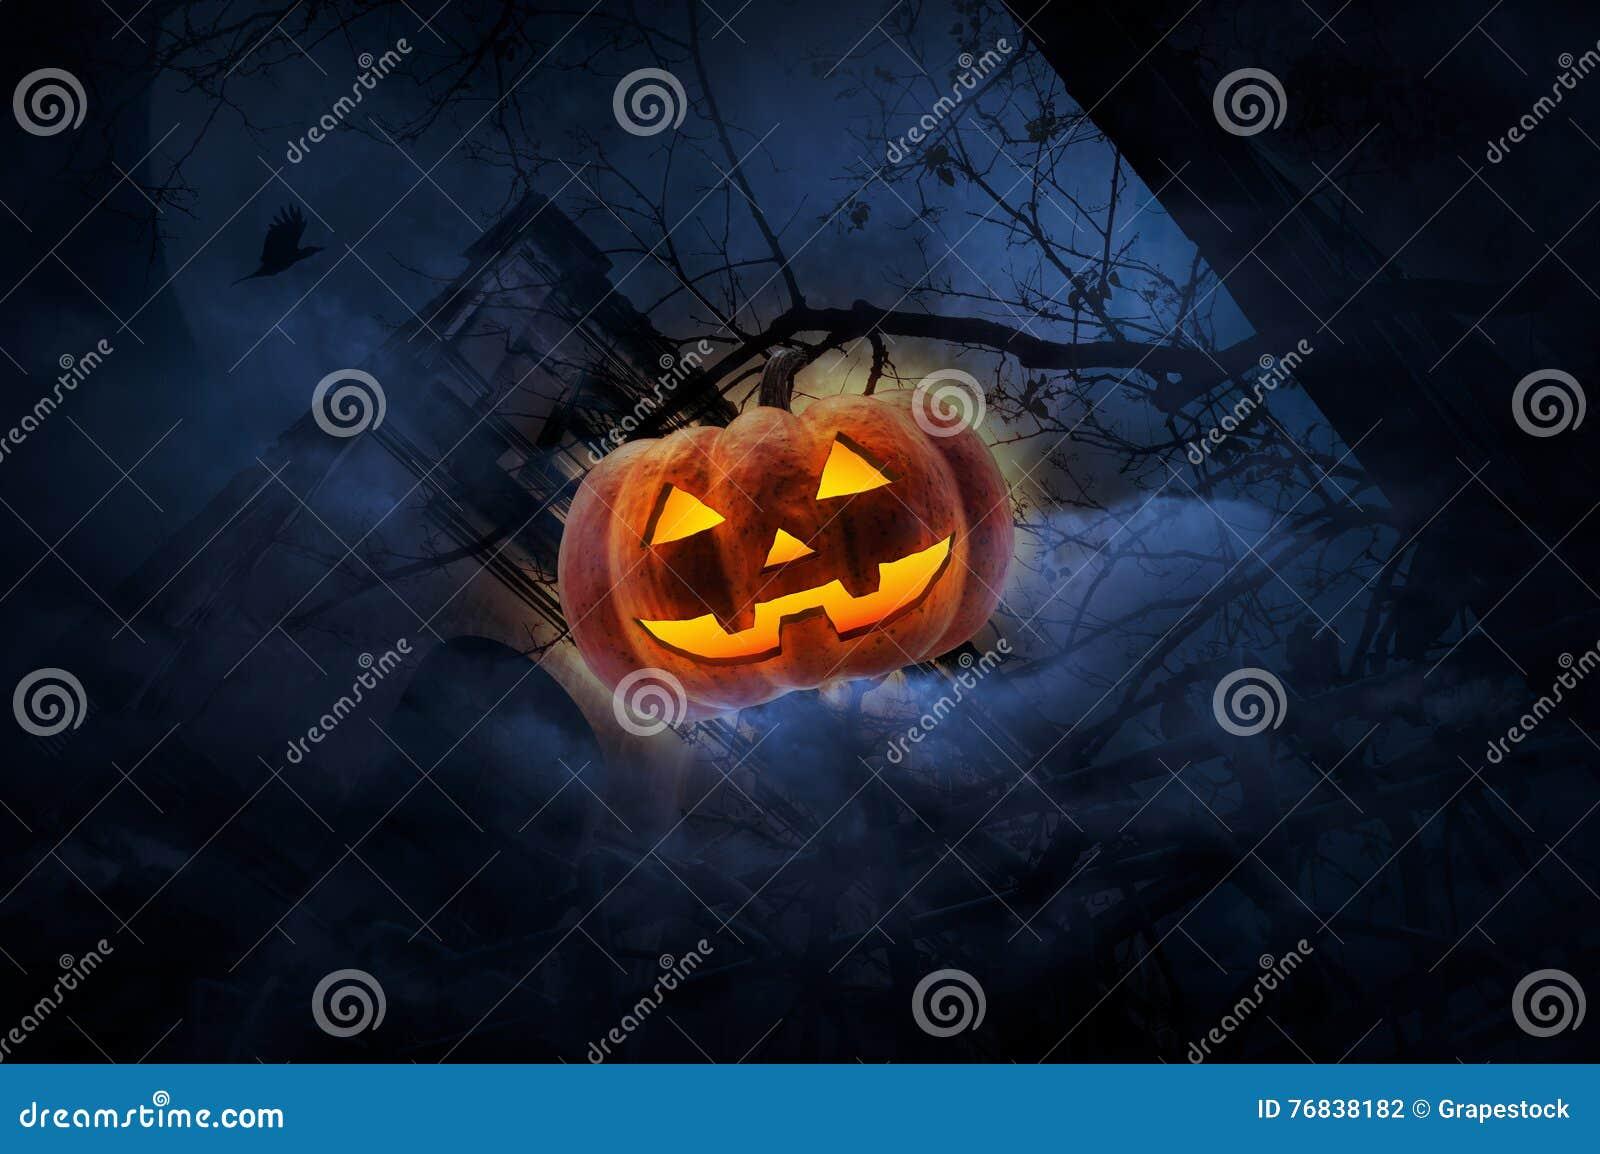 Jack O Lantern pumpkin over old fence, grunge castle, dead tree, bird fly, moon and cloudy sky, Spooky background, Halloween